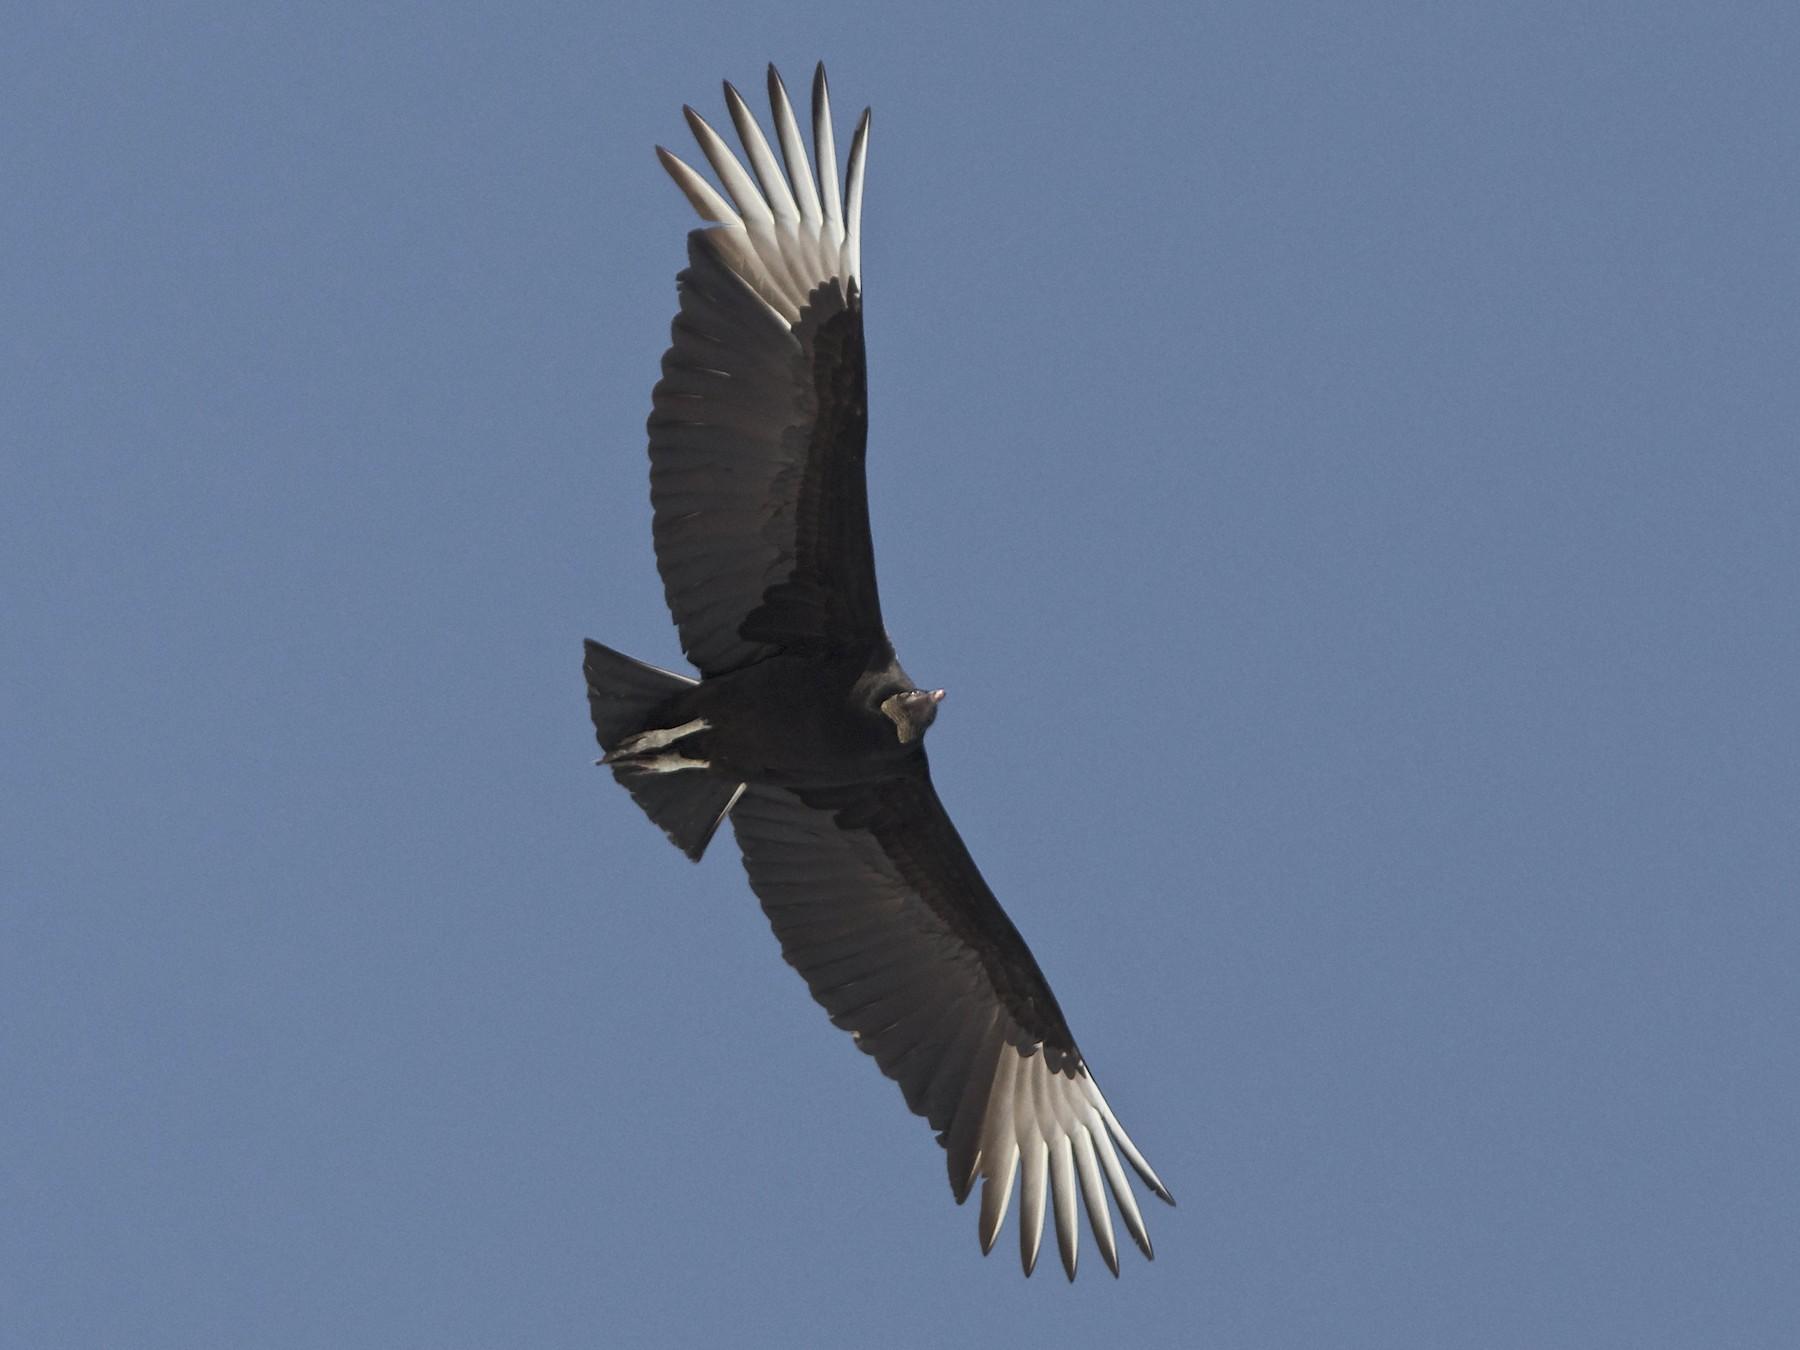 Black Vulture - Holly Merker